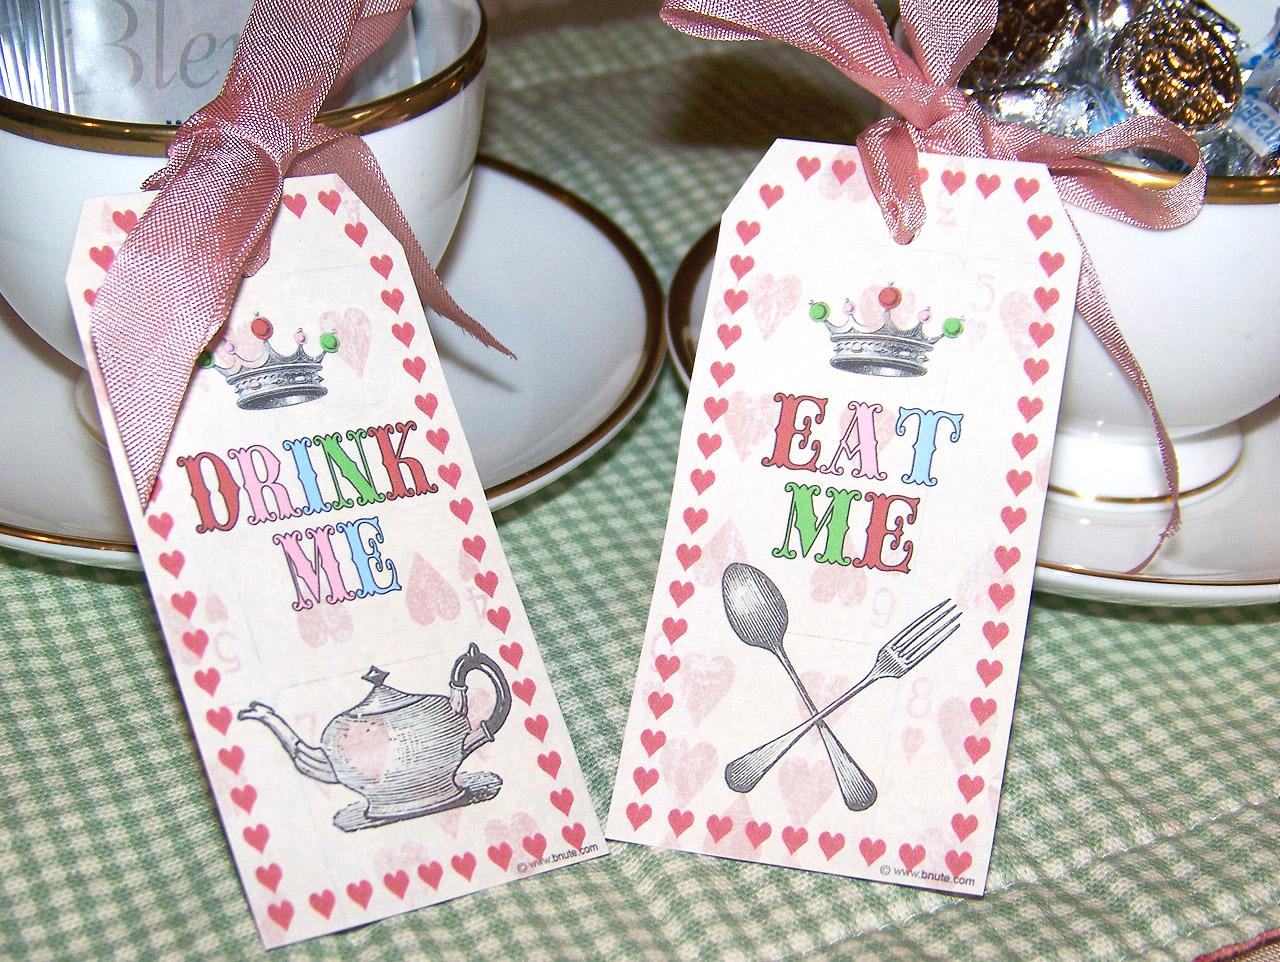 Mad Hatter Tea Party  Invitations, Decorations, Art Activites